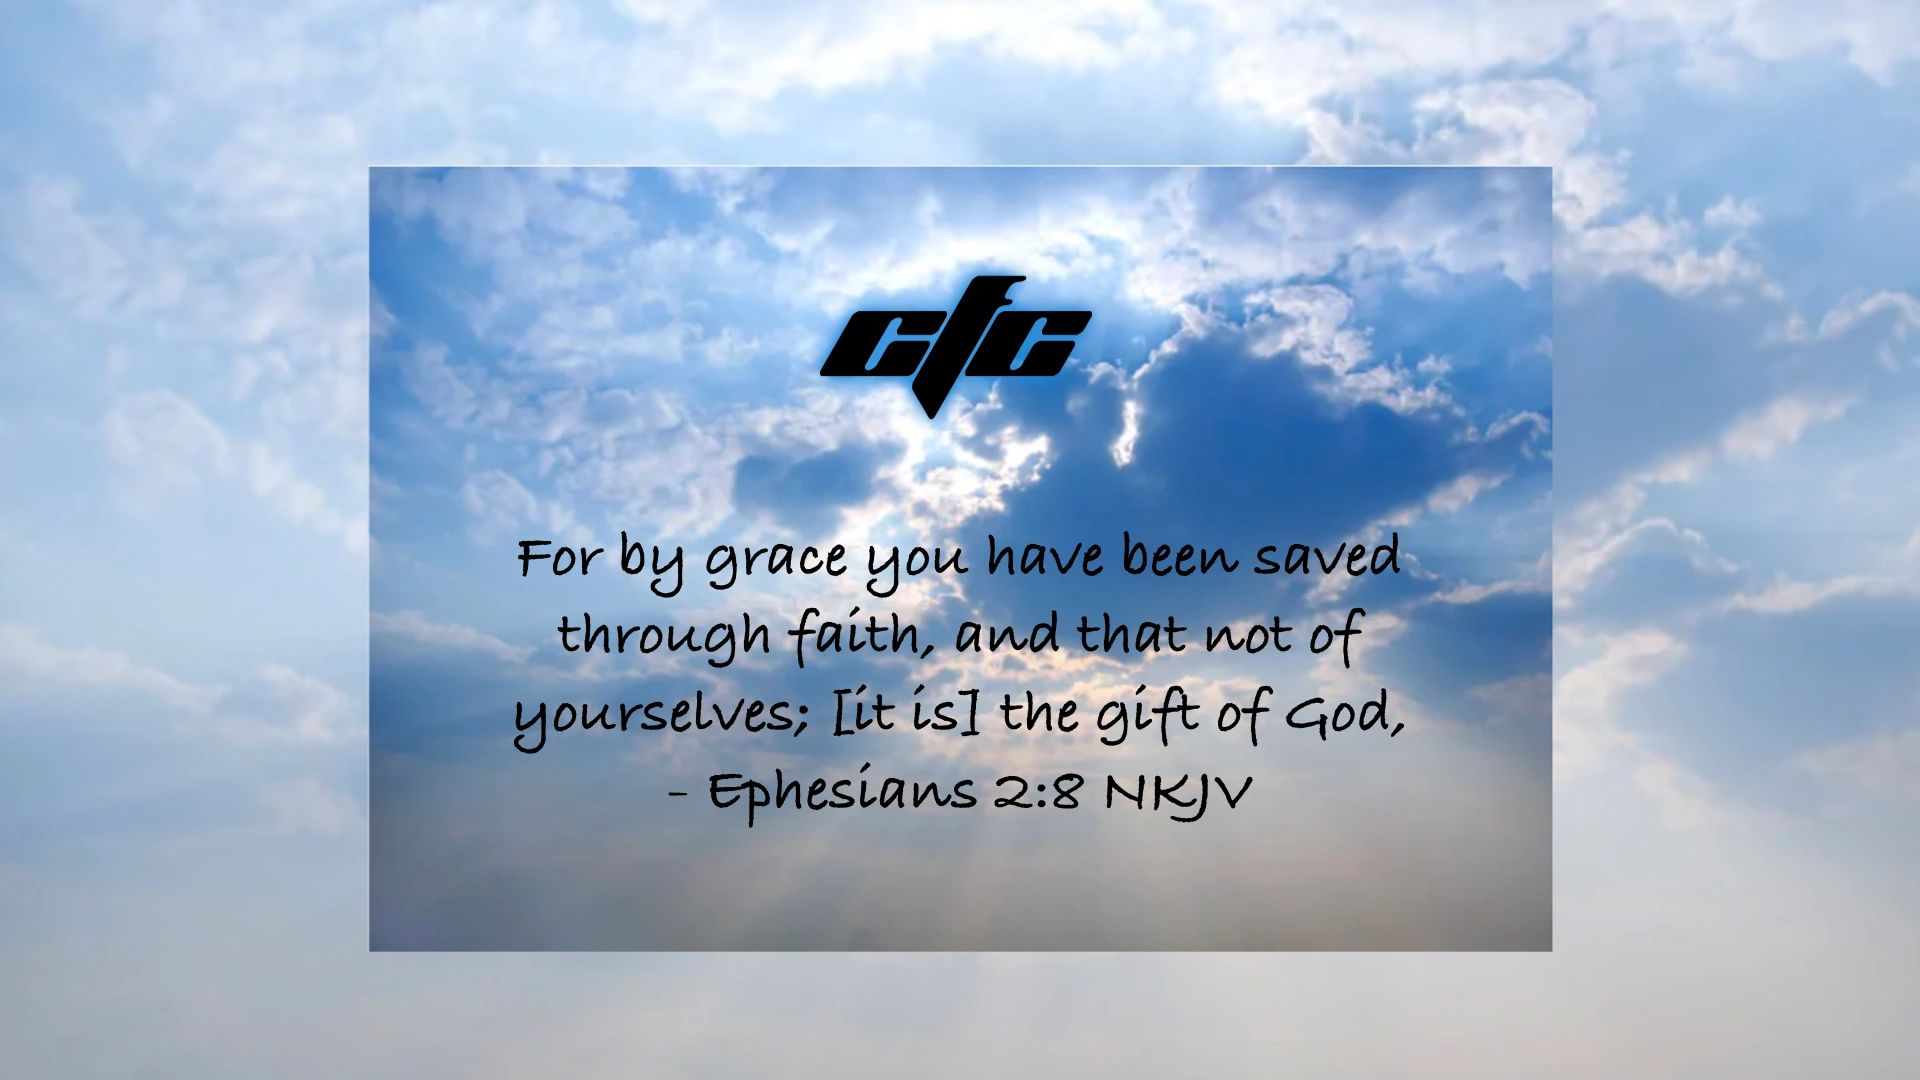 HOME | Christian Family Church, Lakeville, MN 55044, God, Jesus